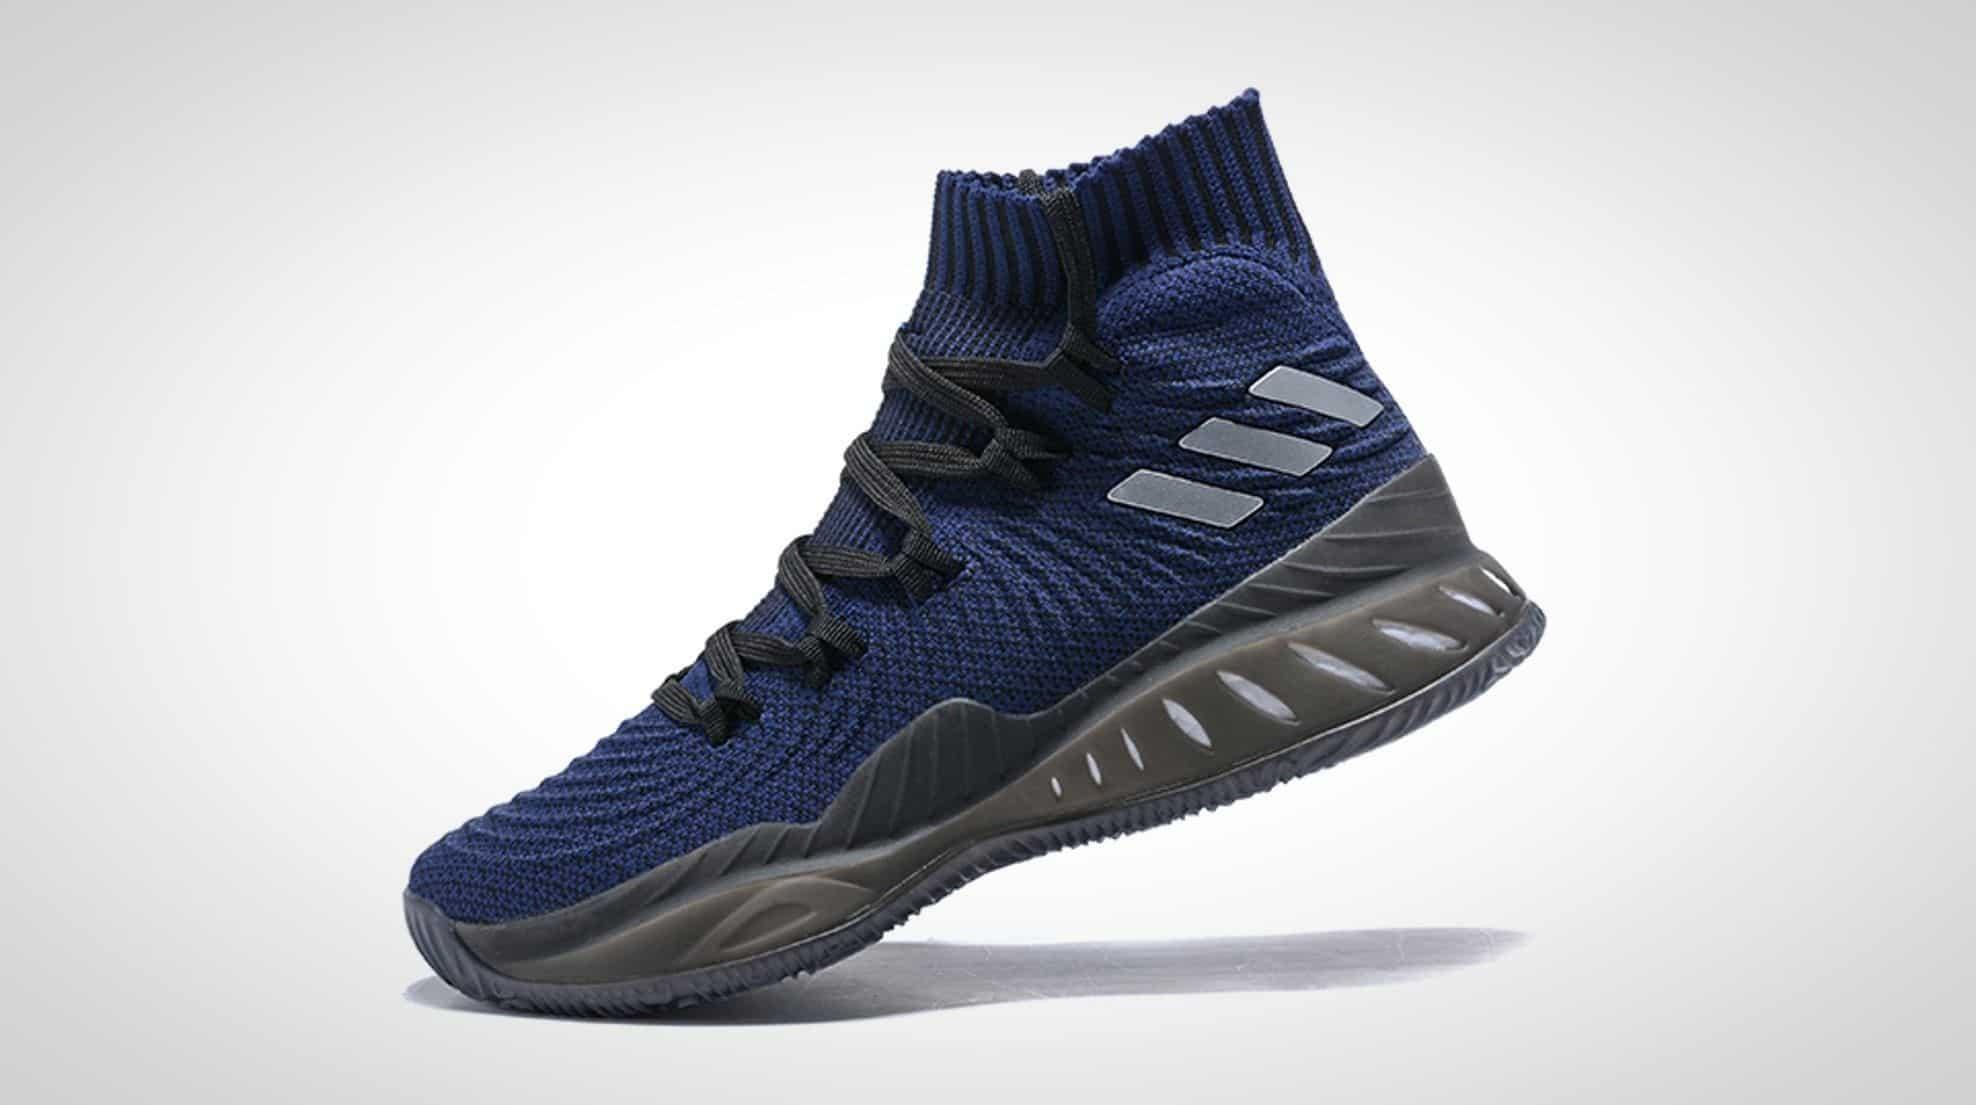 purchase cheap b4190 ad9c6 Adidas Men s Crazy Explosive 2017 Primeknit Shoe Review ...